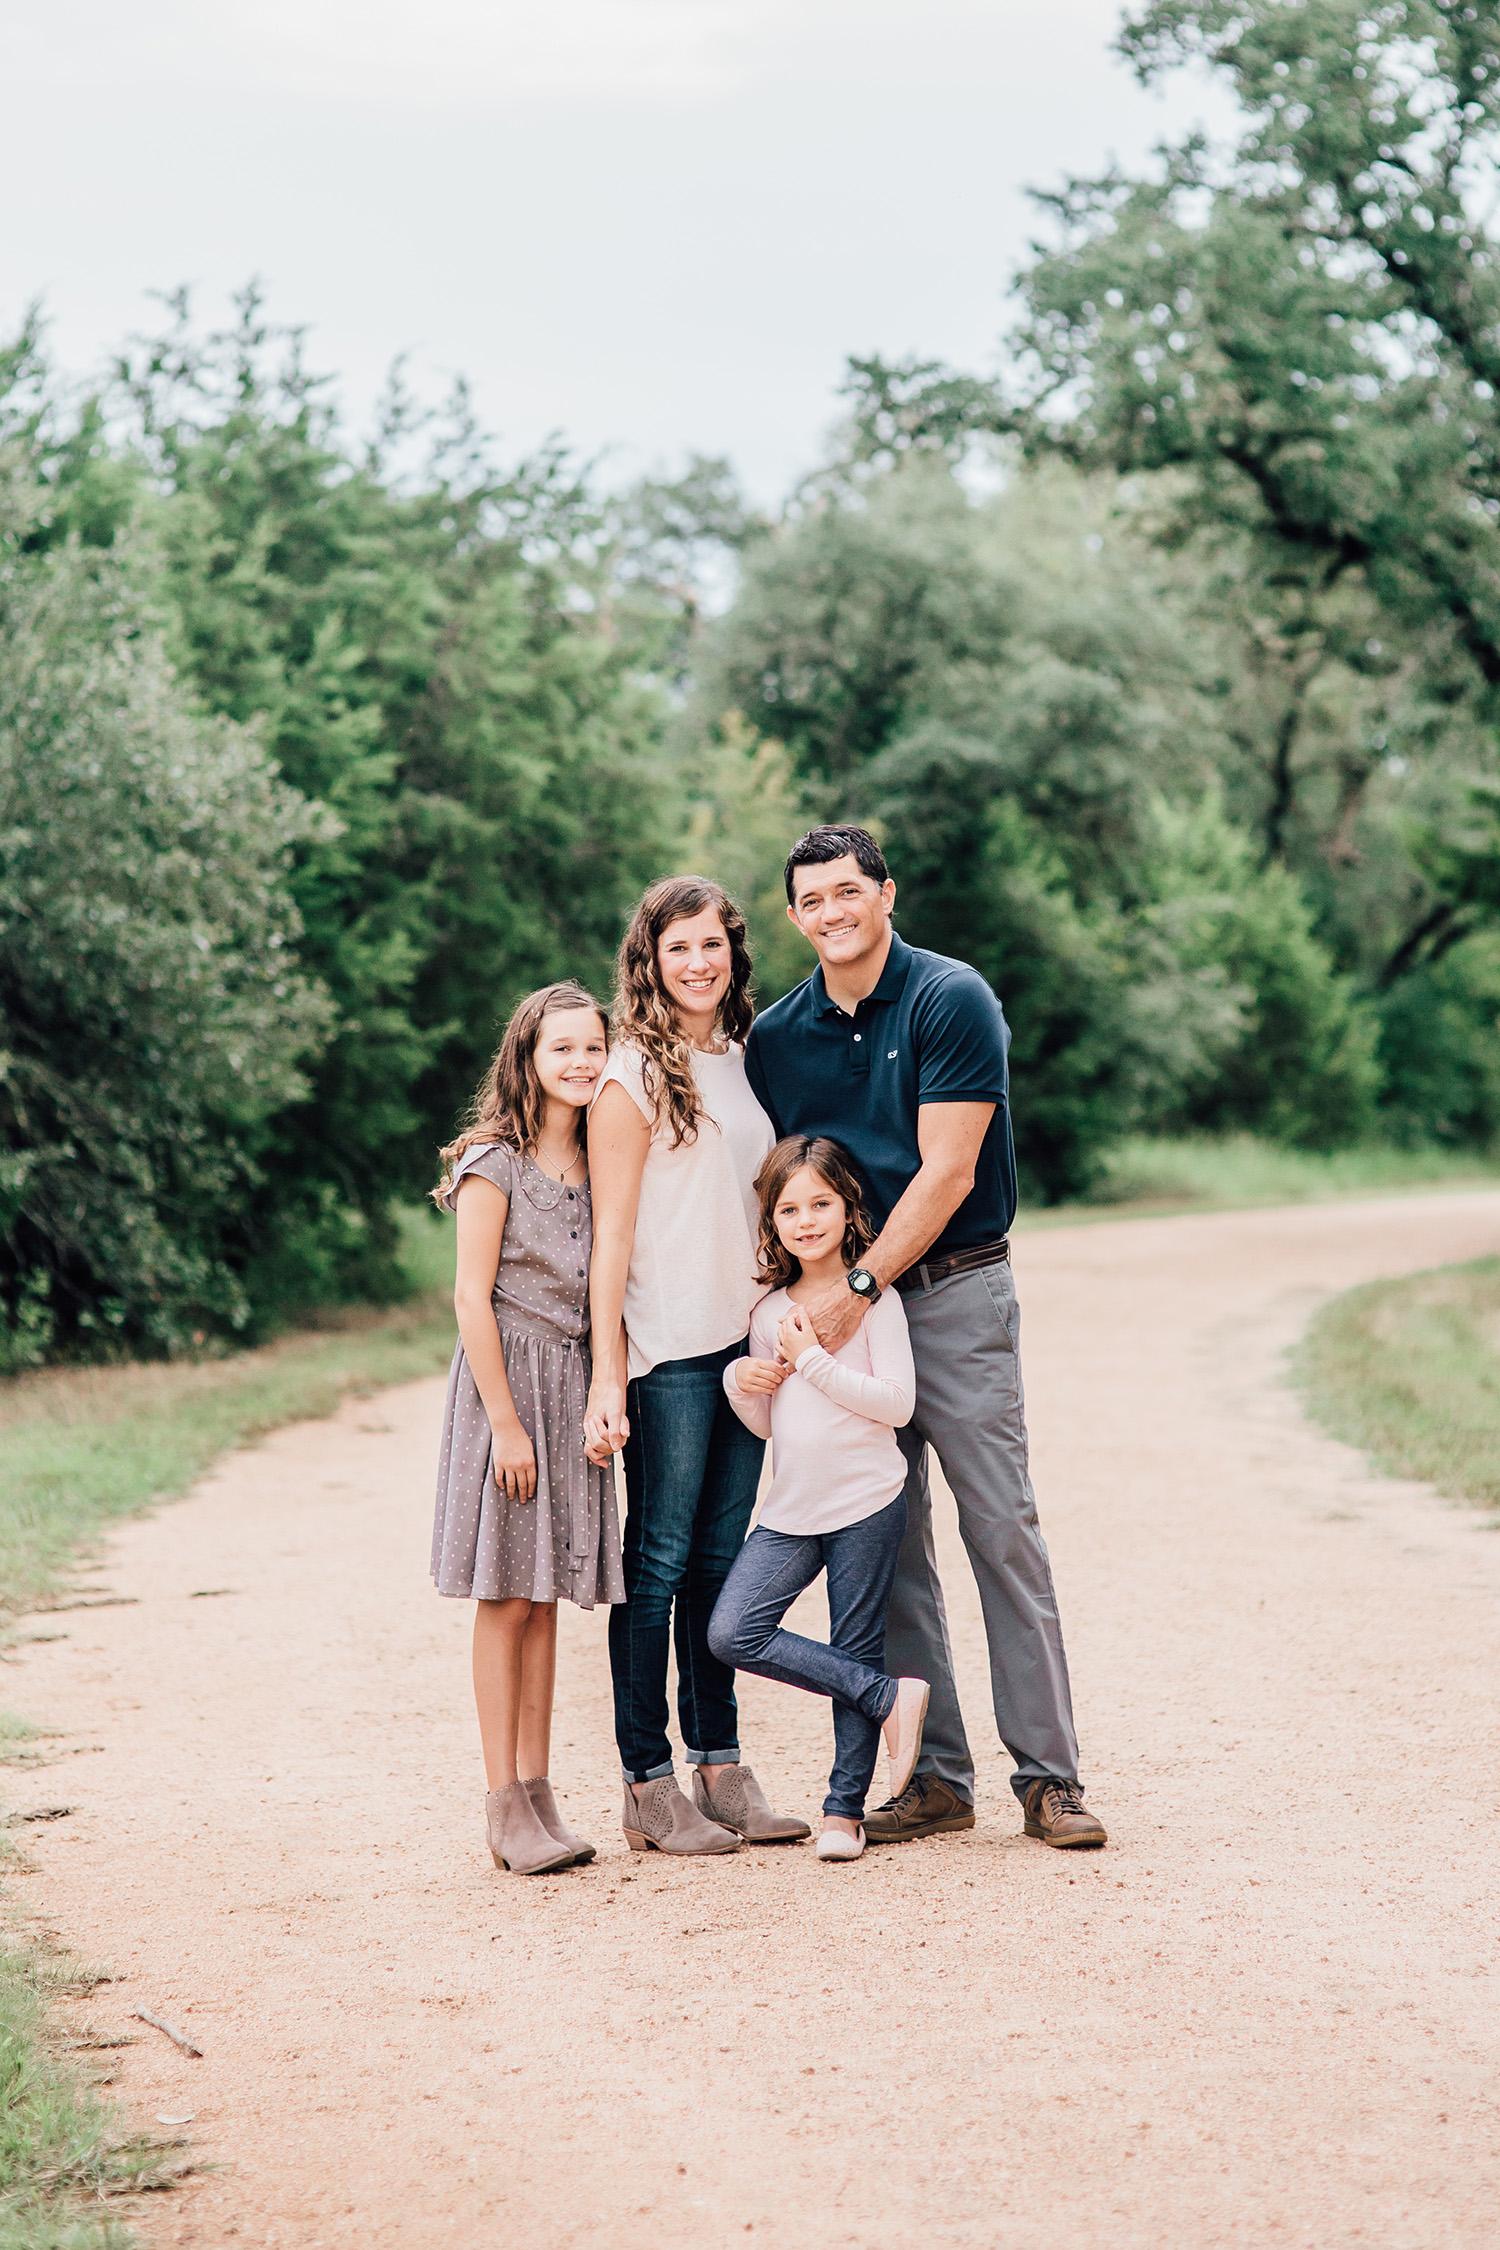 Austin Family Photographer 58.jpg